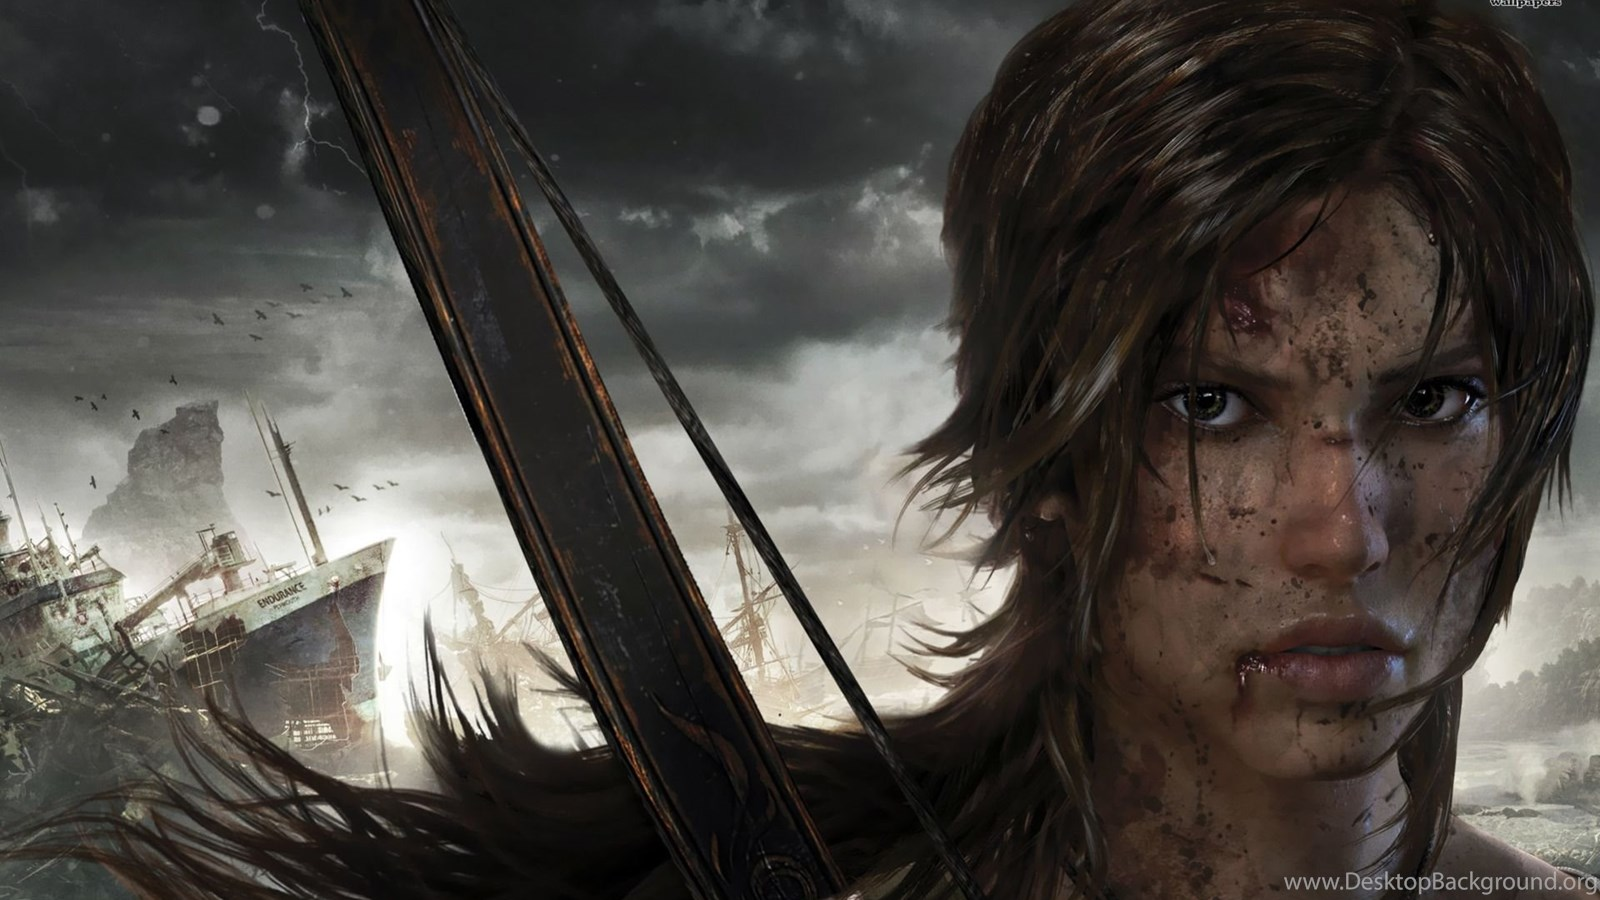 Lara Croft Tomb Raider Wallpapers Game Wallpapers Desktop Background